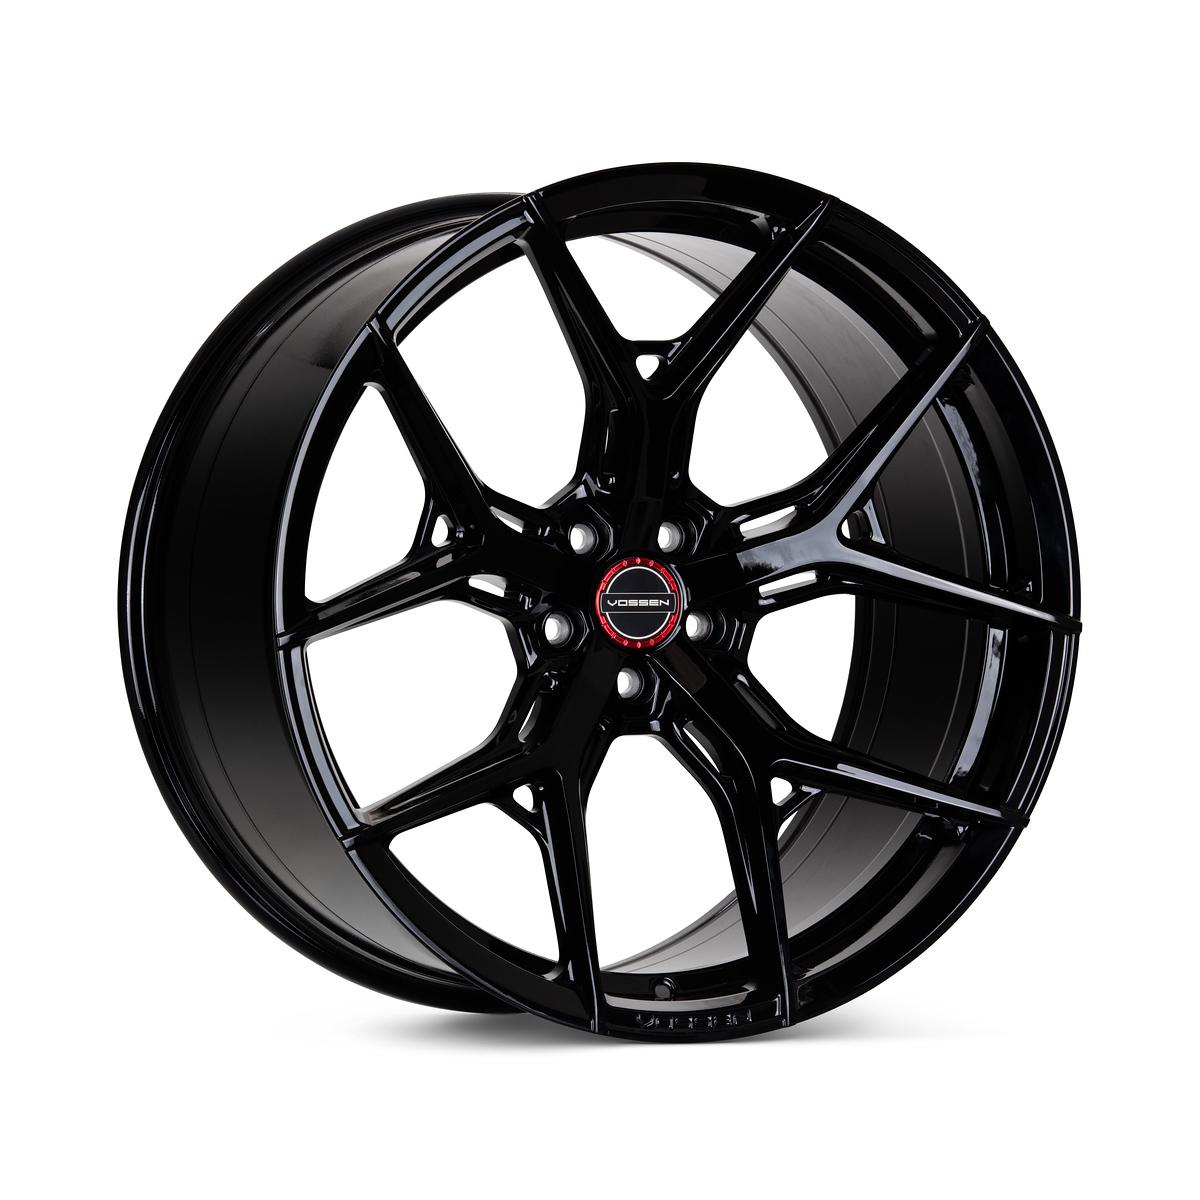 vossen-hf-5---c25-gloss-black---hybrid-forged-series-----vossen-wheels-2019----0015_49179601597_o-X3.jpg